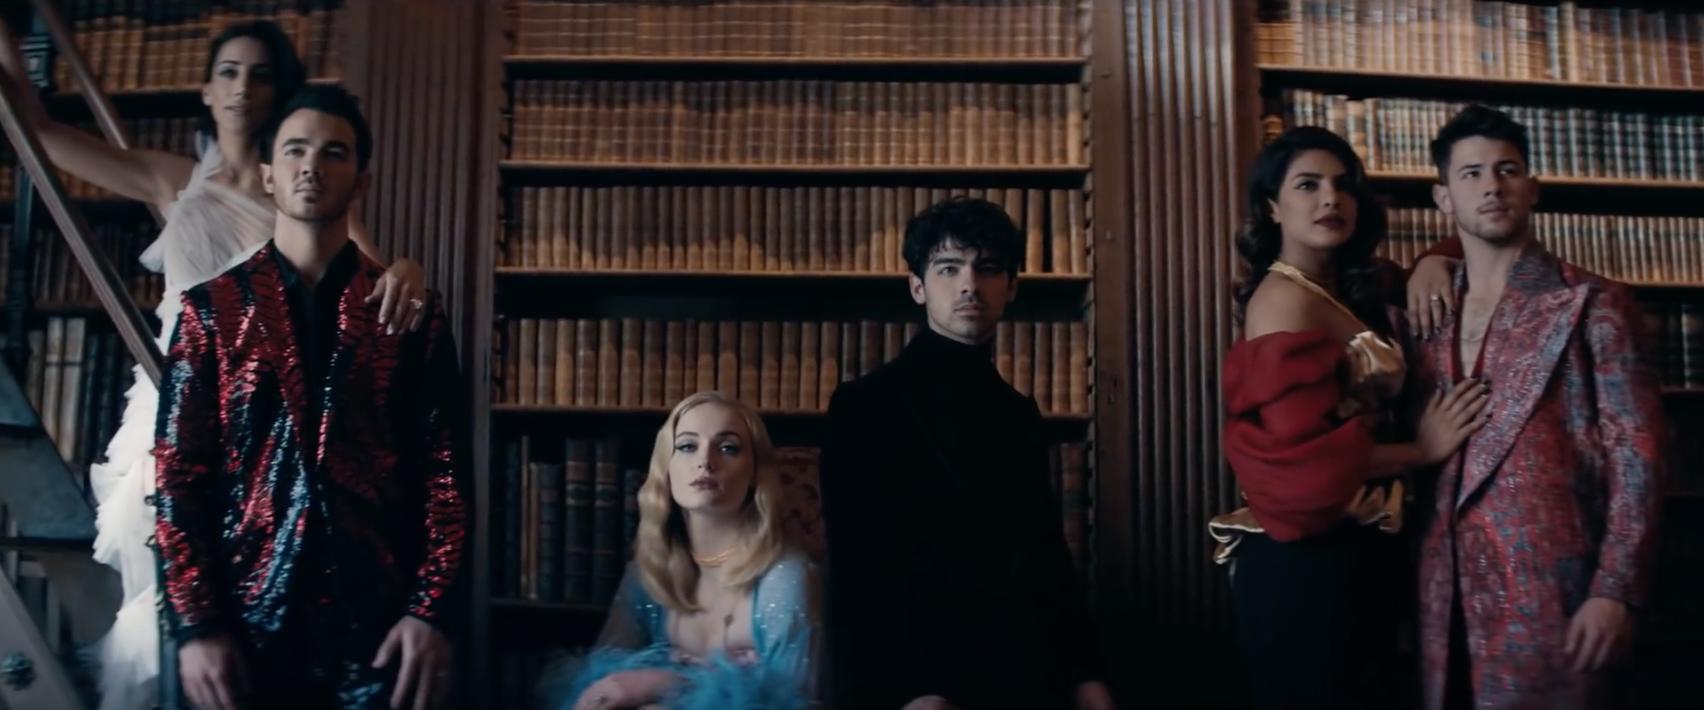 "A still of the royal family from the music video for ""Sucker.""  From left: Danielle Jonas, Kevin Jonas, Sophie Turner, Joe Jonas, Priyanka Chopra Jonas, and Nick Jonas"